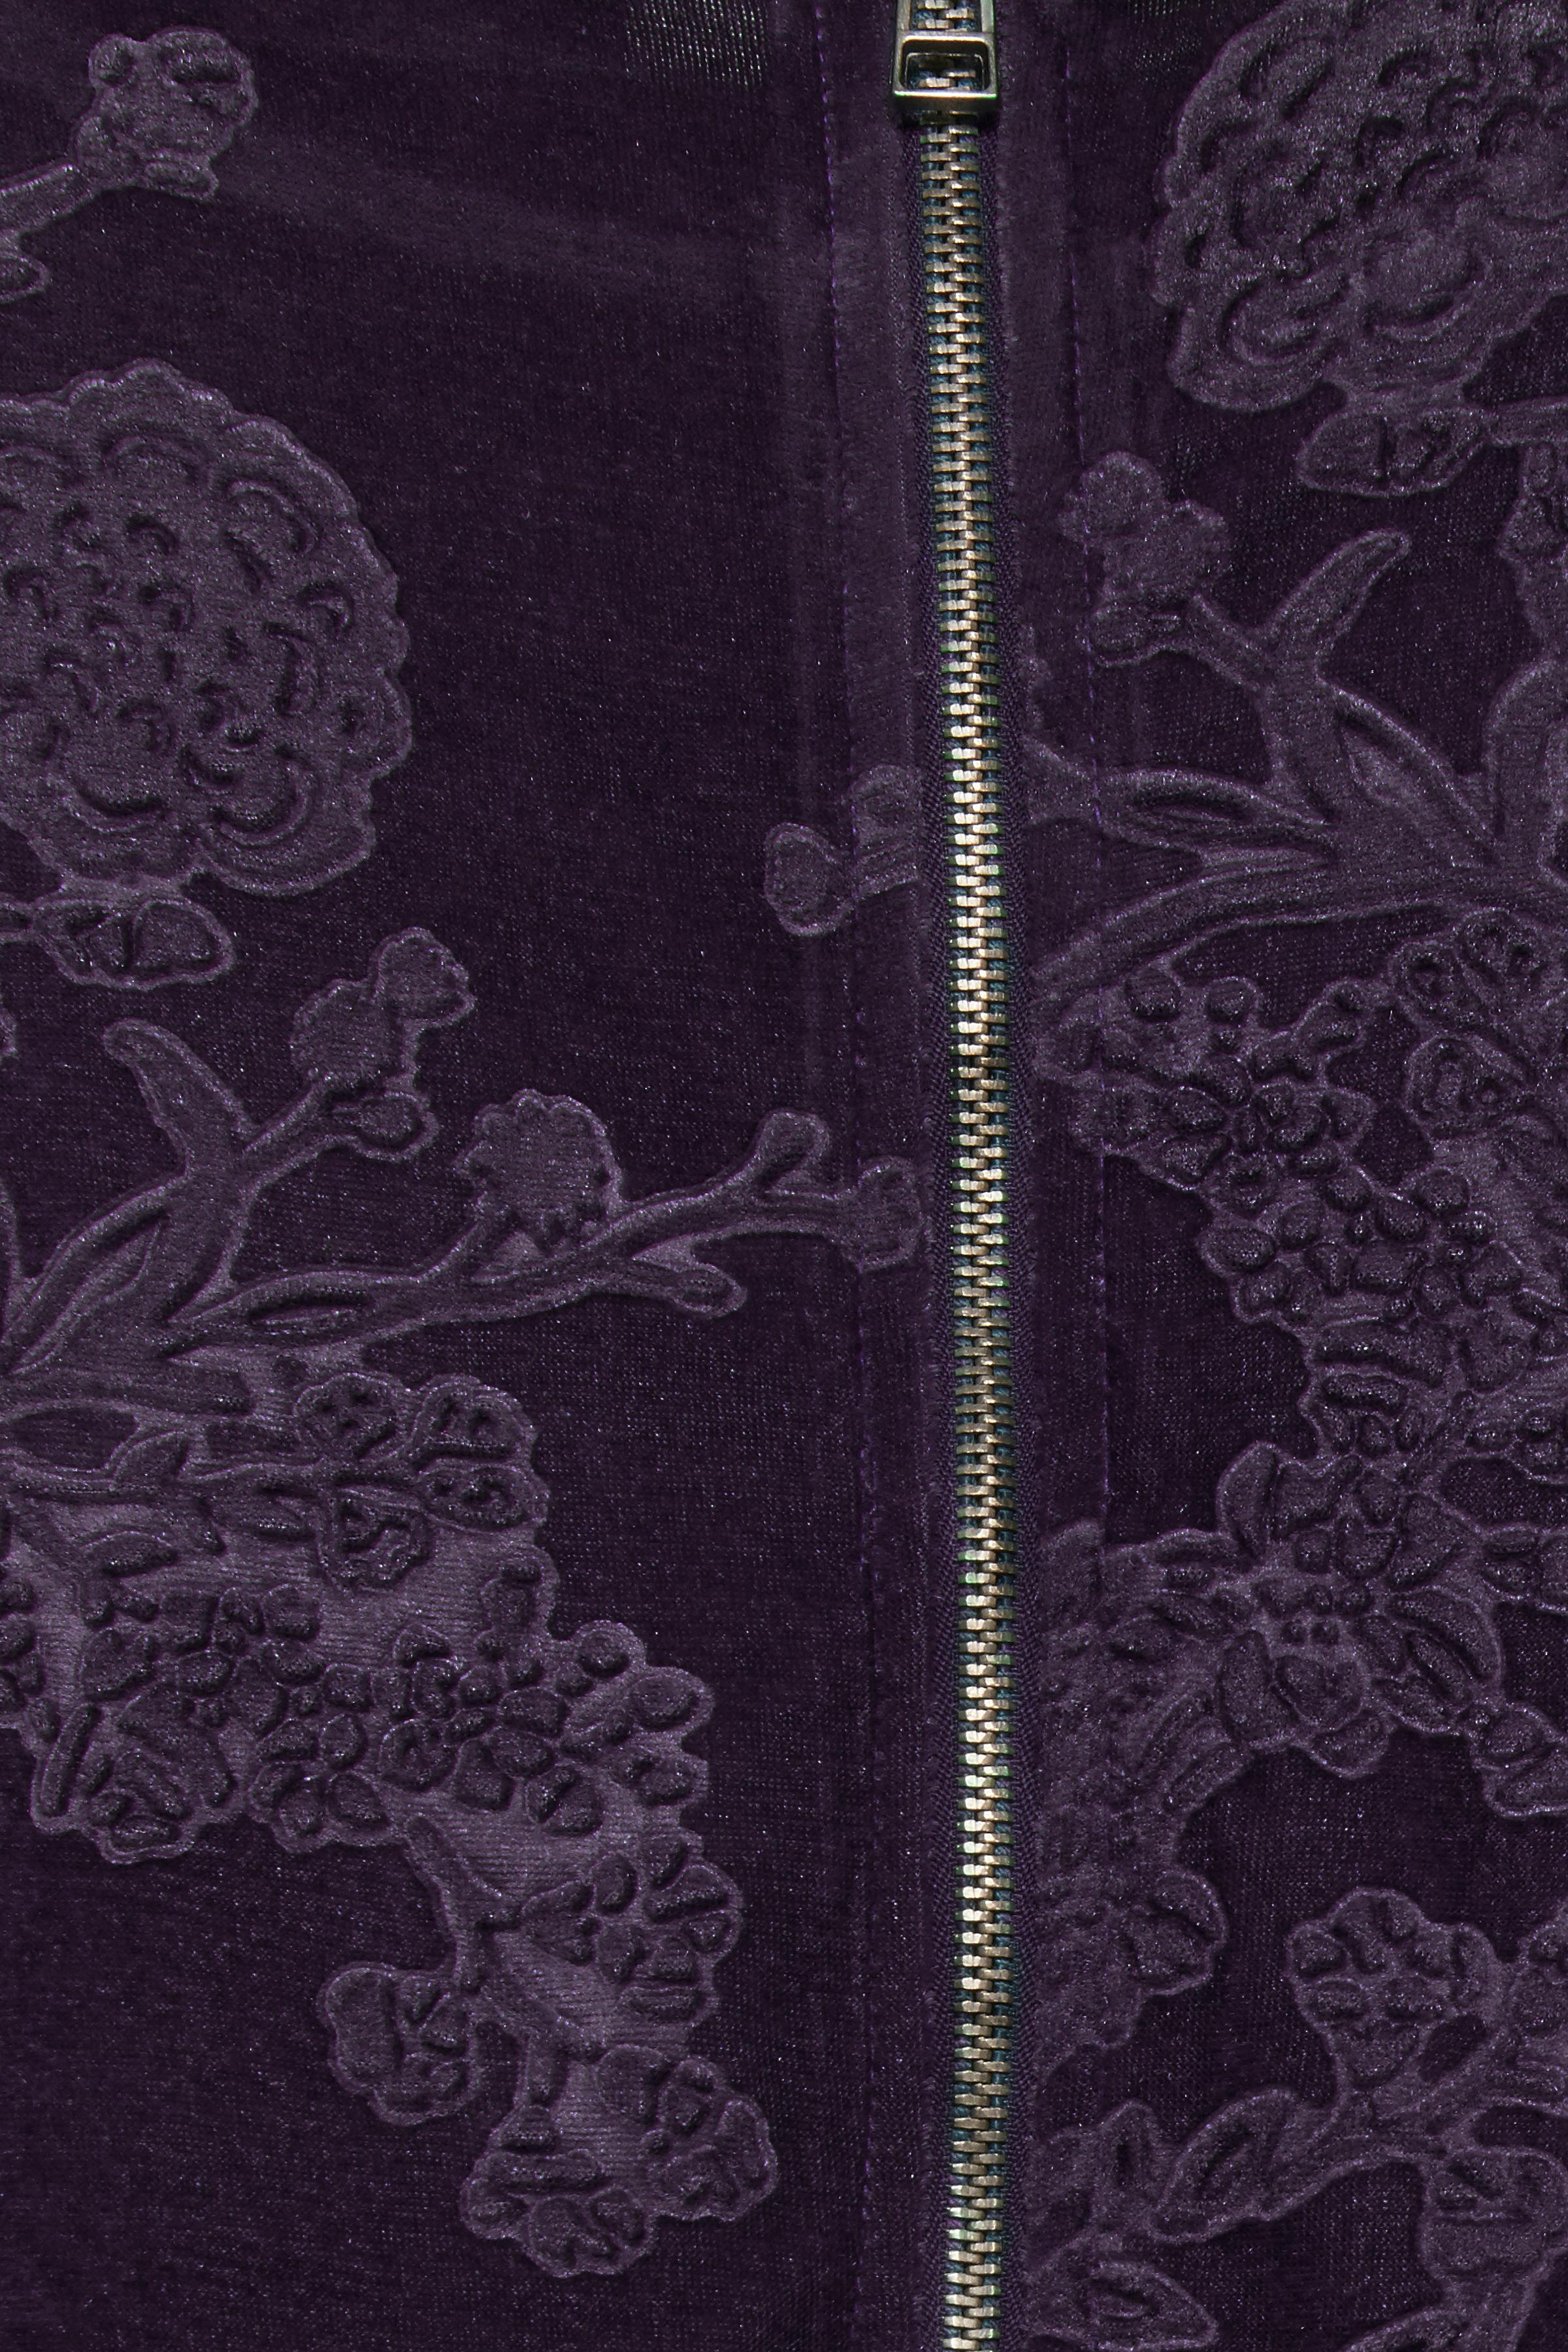 Blackberry Purple Jerseykjole fra b.young – Køb Blackberry Purple Jerseykjole fra str. XS-XXL her